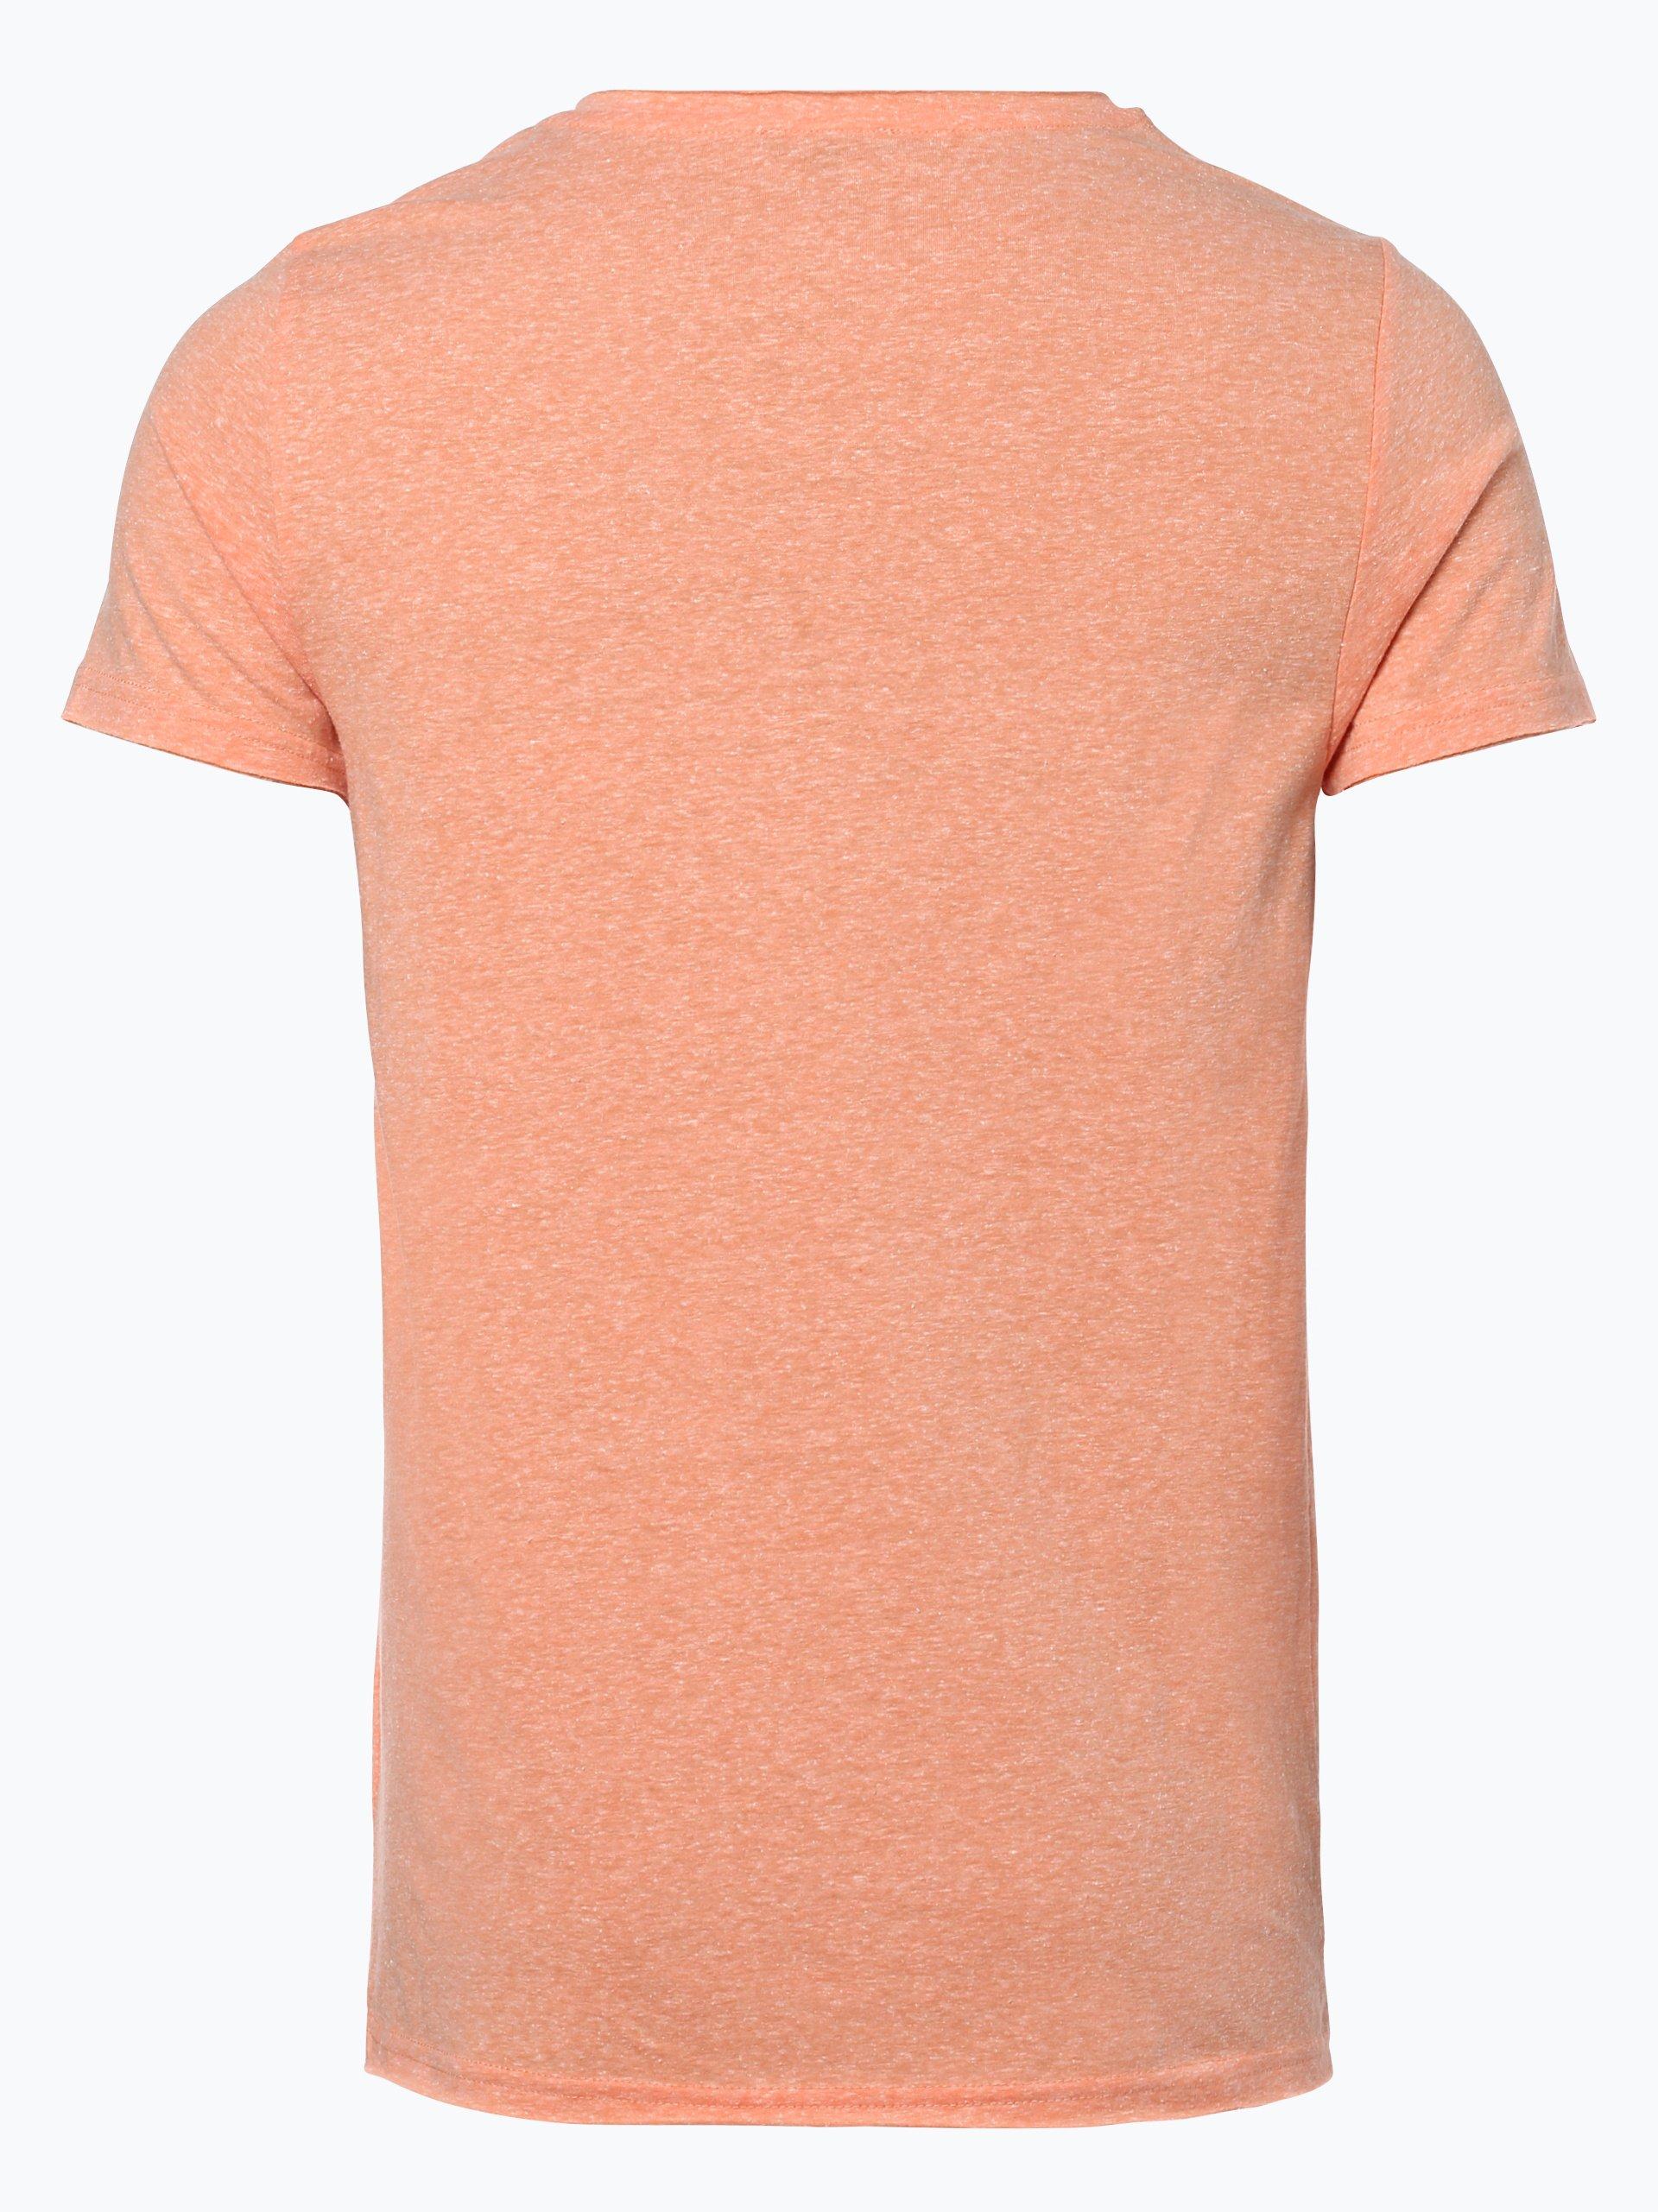 review herren t shirt orange gemustert online kaufen. Black Bedroom Furniture Sets. Home Design Ideas